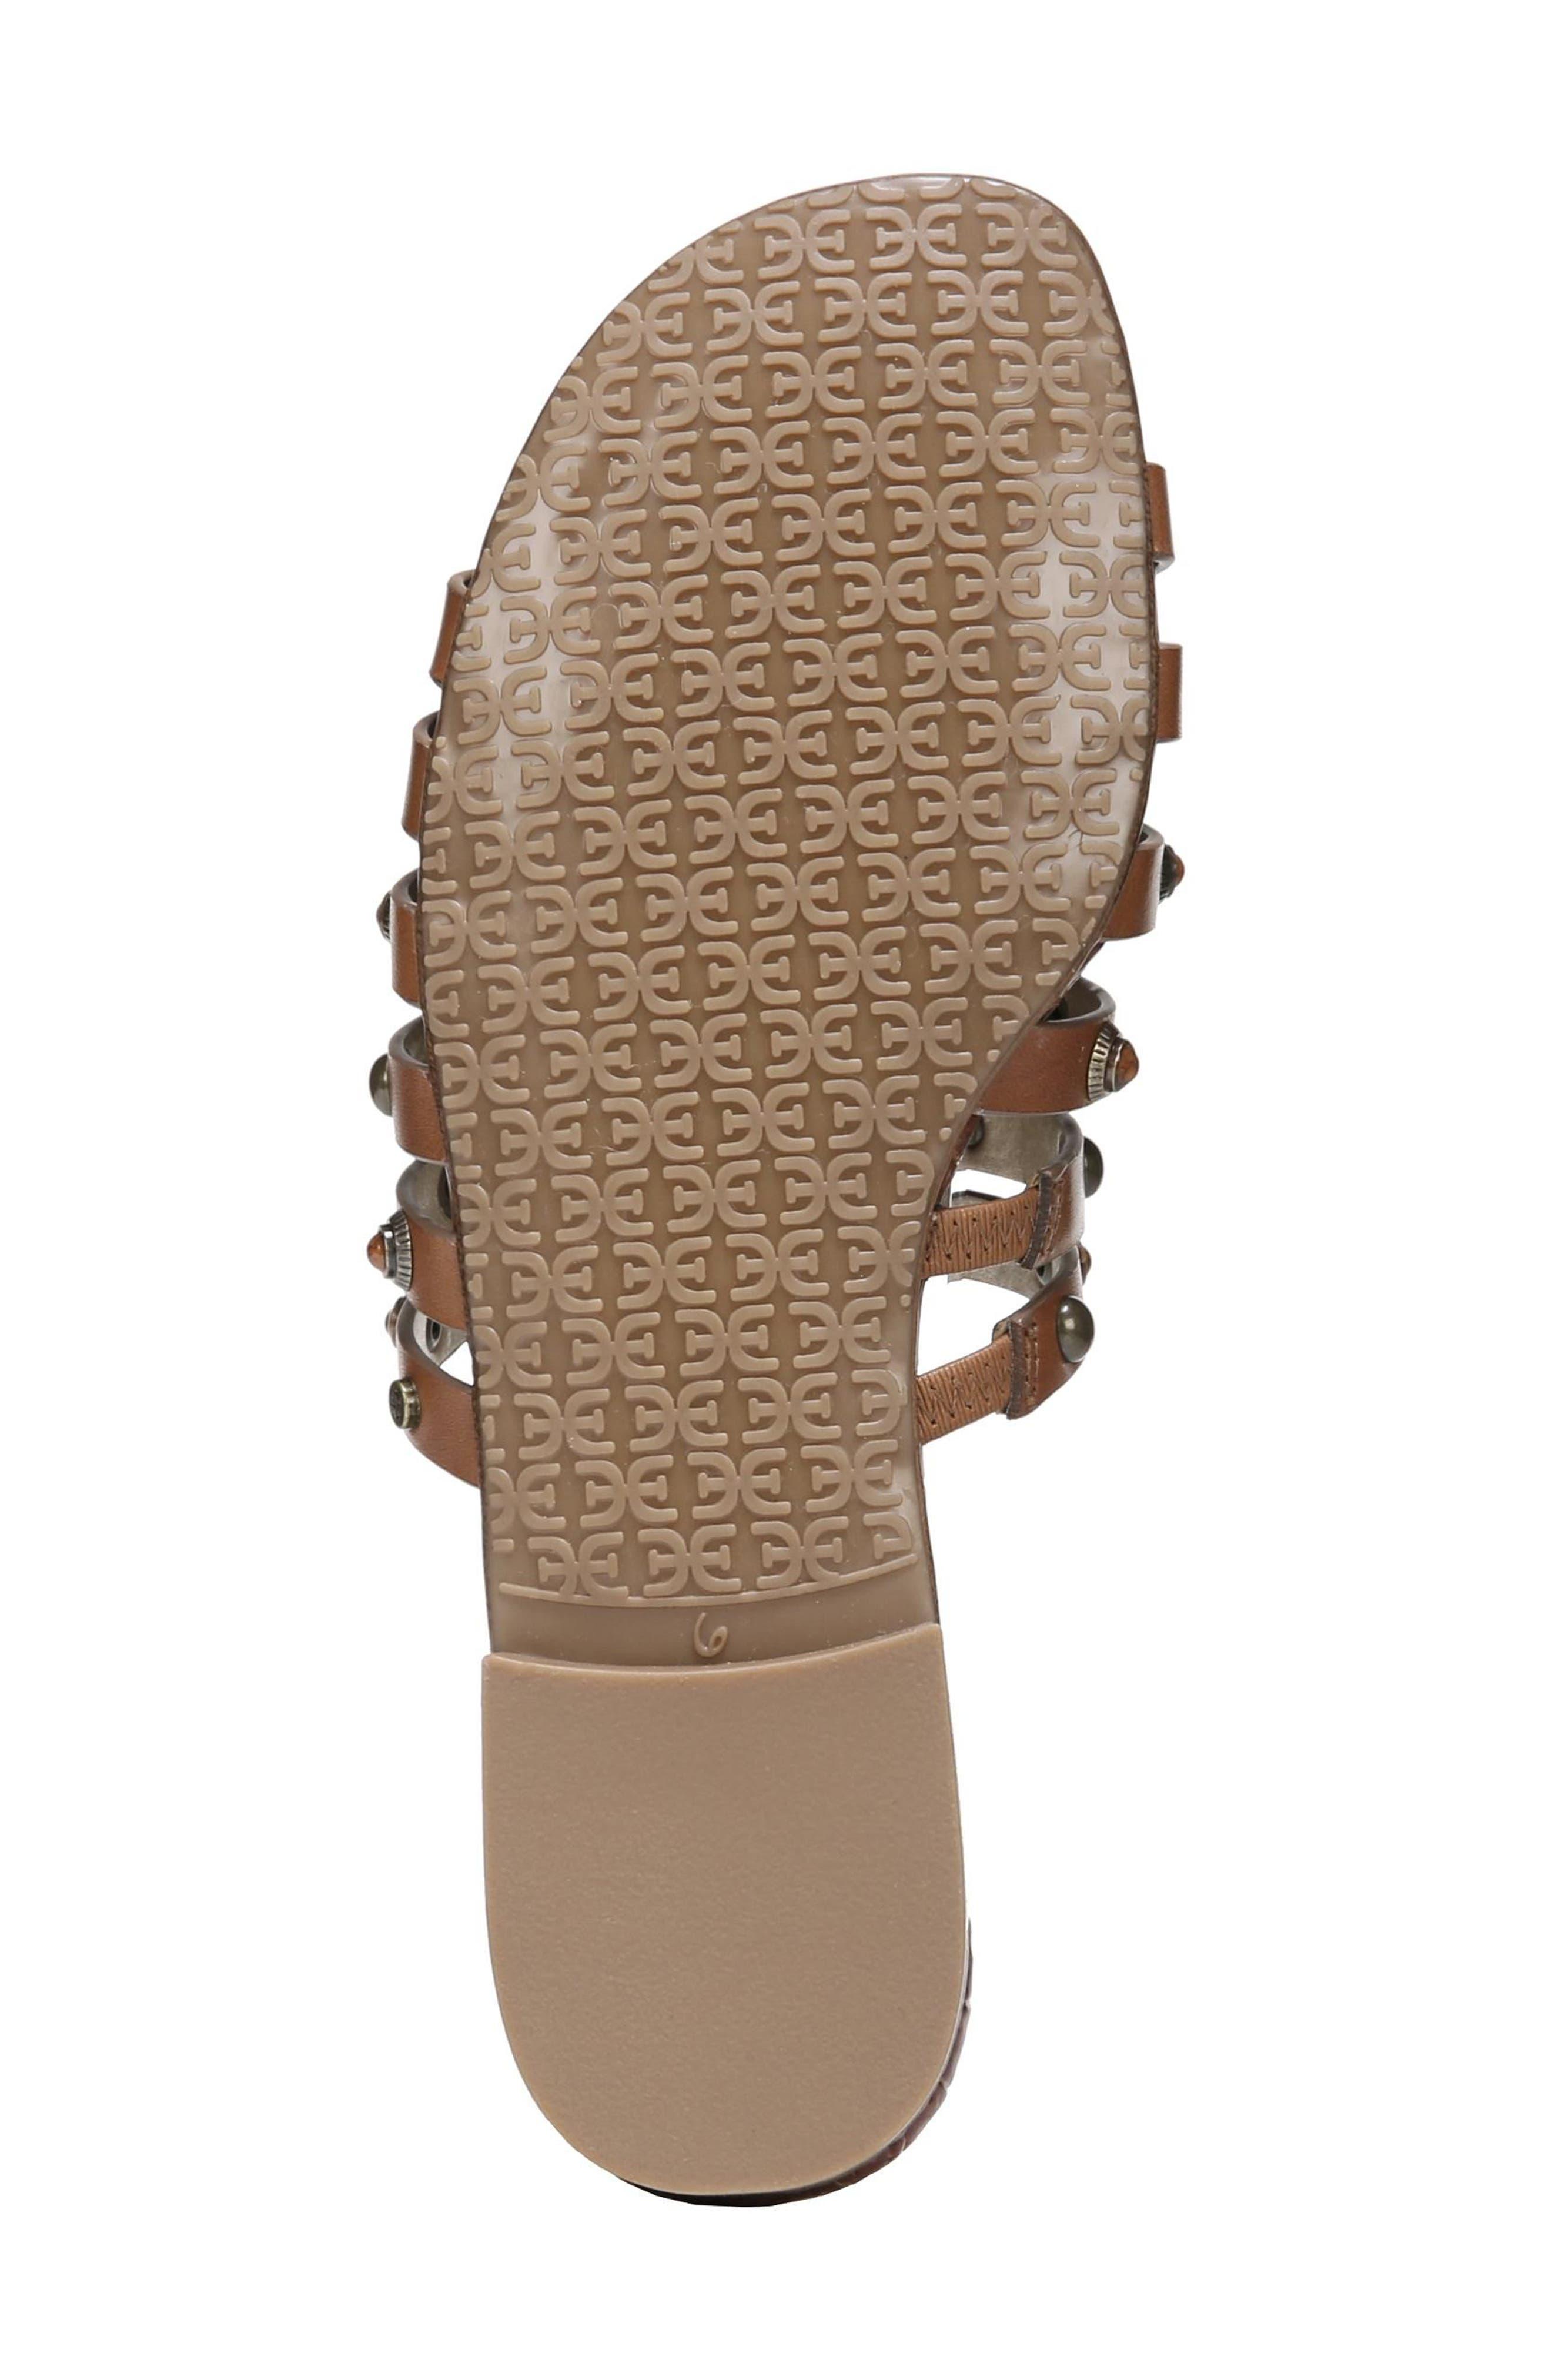 Brea Studded Slide Sandal,                             Alternate thumbnail 6, color,                             Luggage Leather